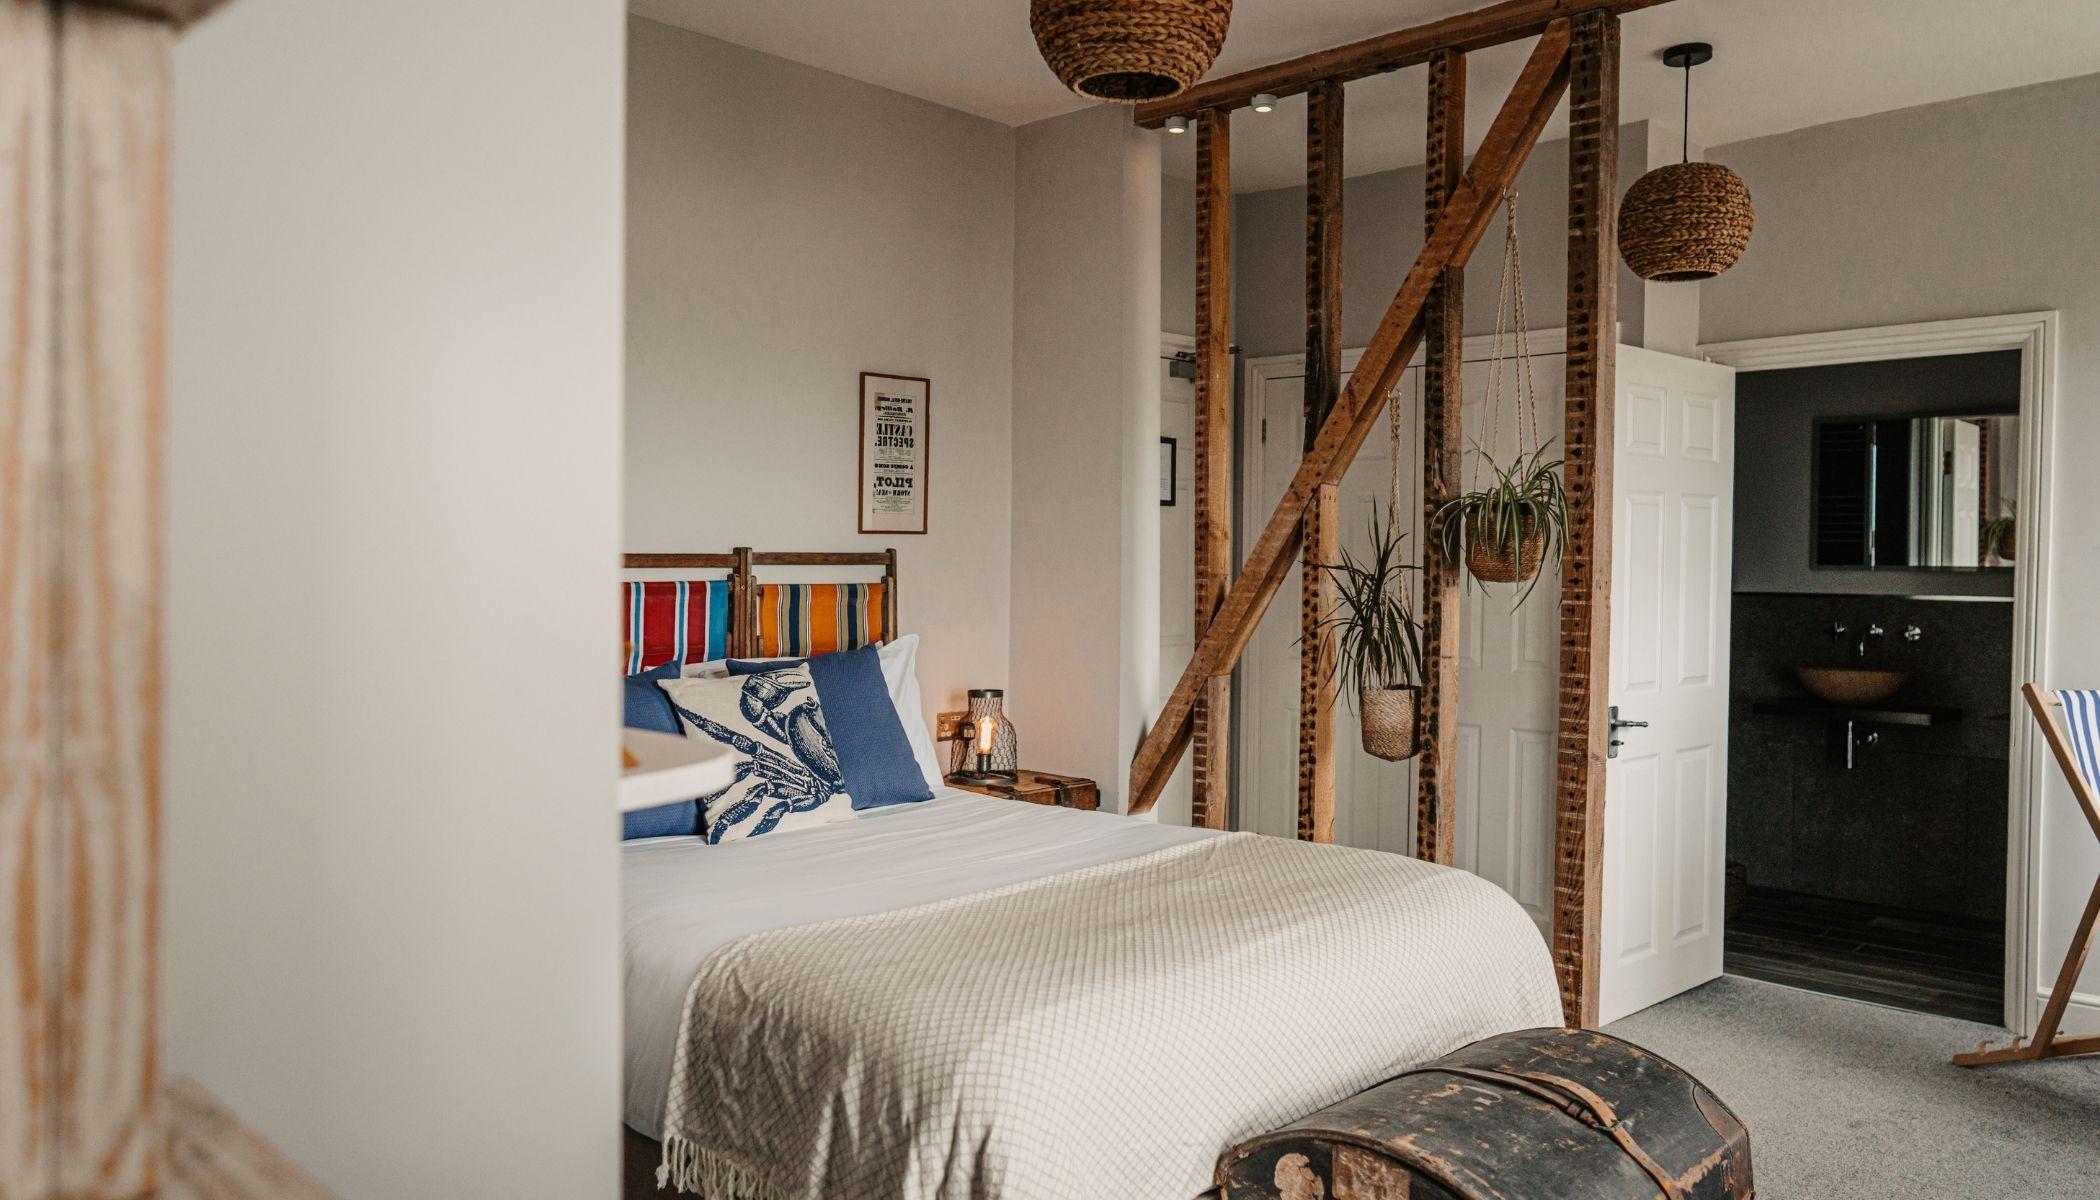 Coastal rooms